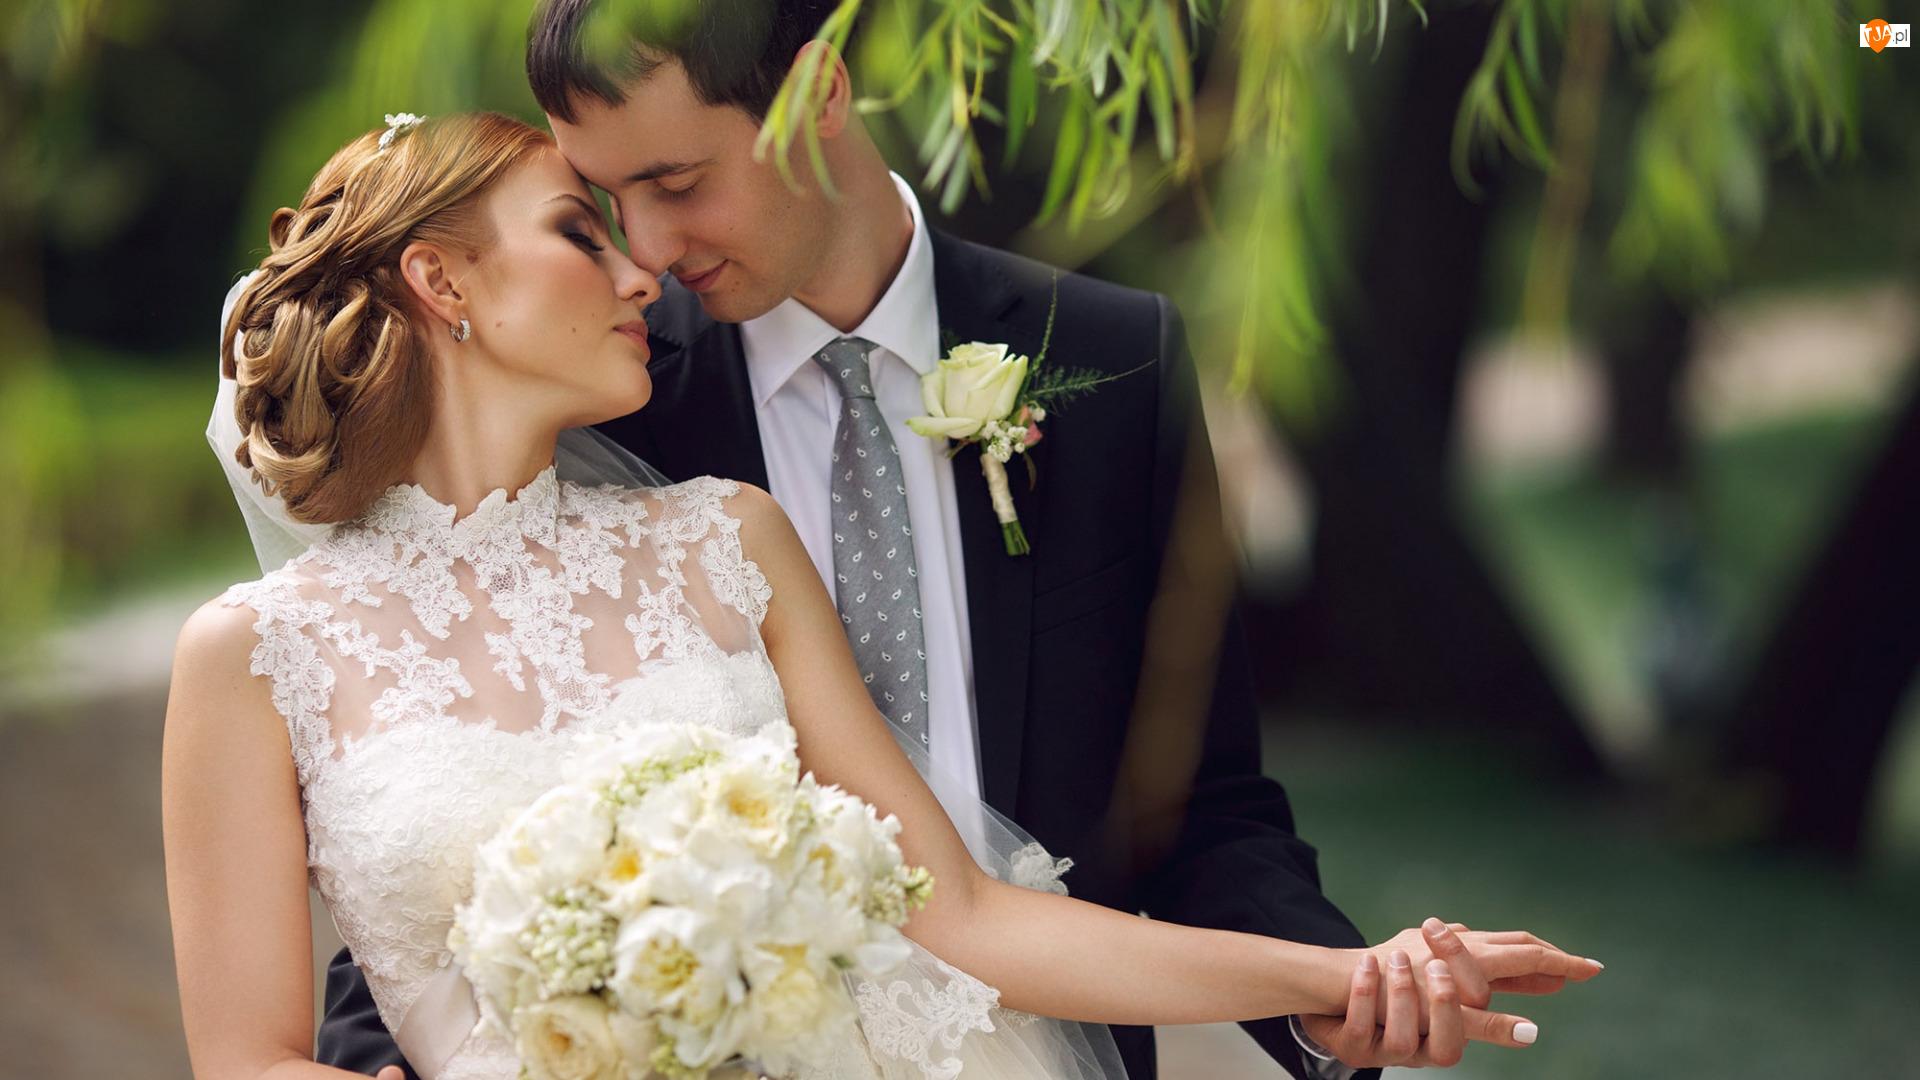 Pan młody, Ślub, Panna młoda